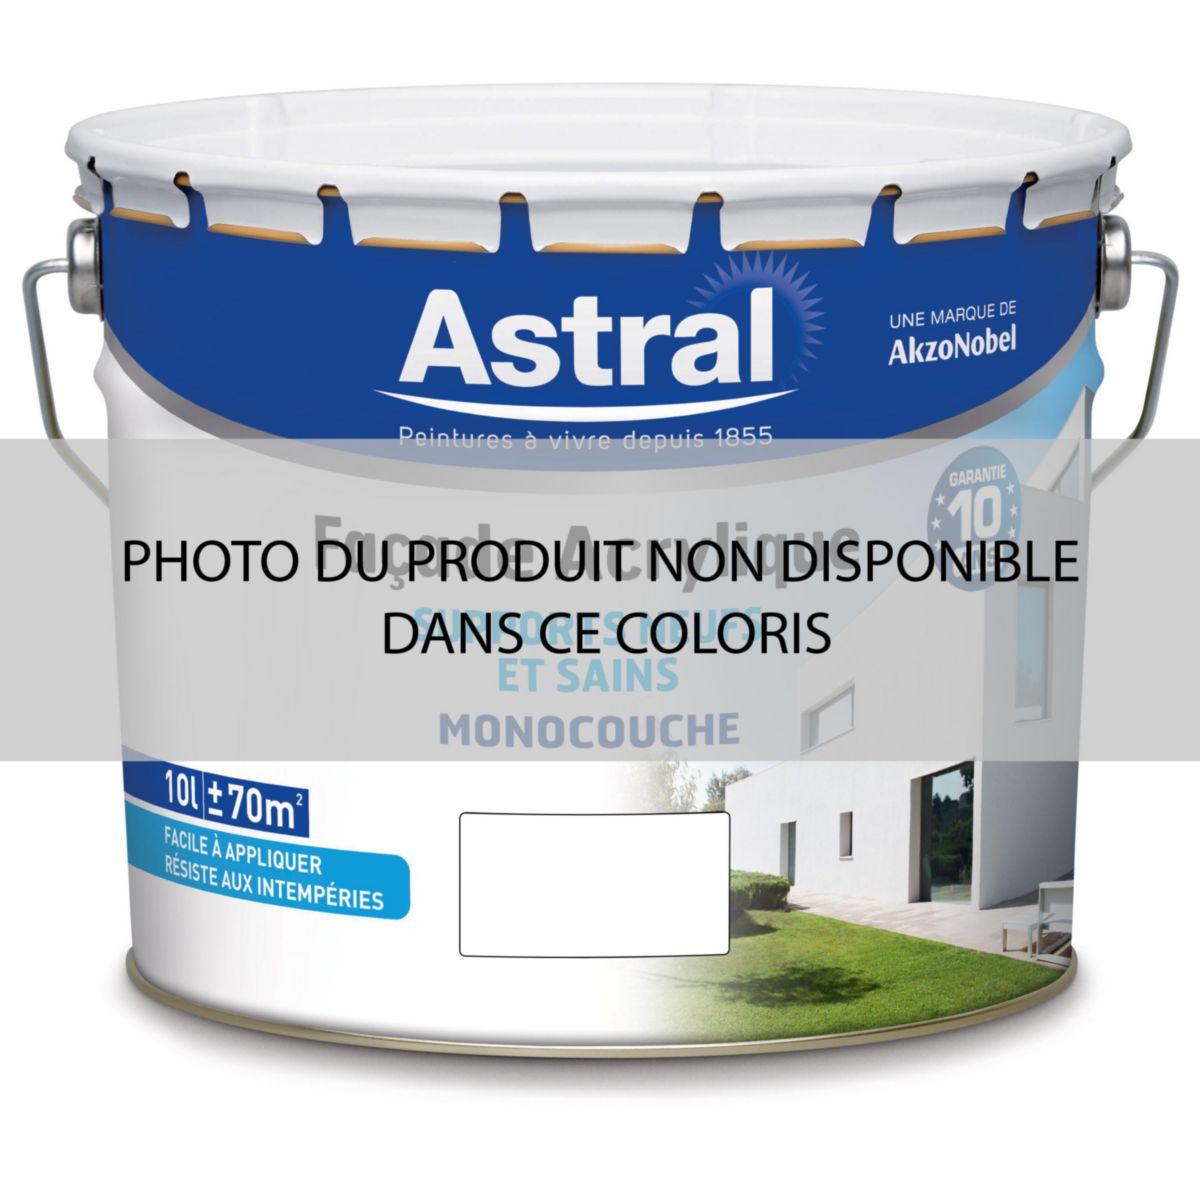 astral peinture monocouche fa ade acrylique base clear. Black Bedroom Furniture Sets. Home Design Ideas